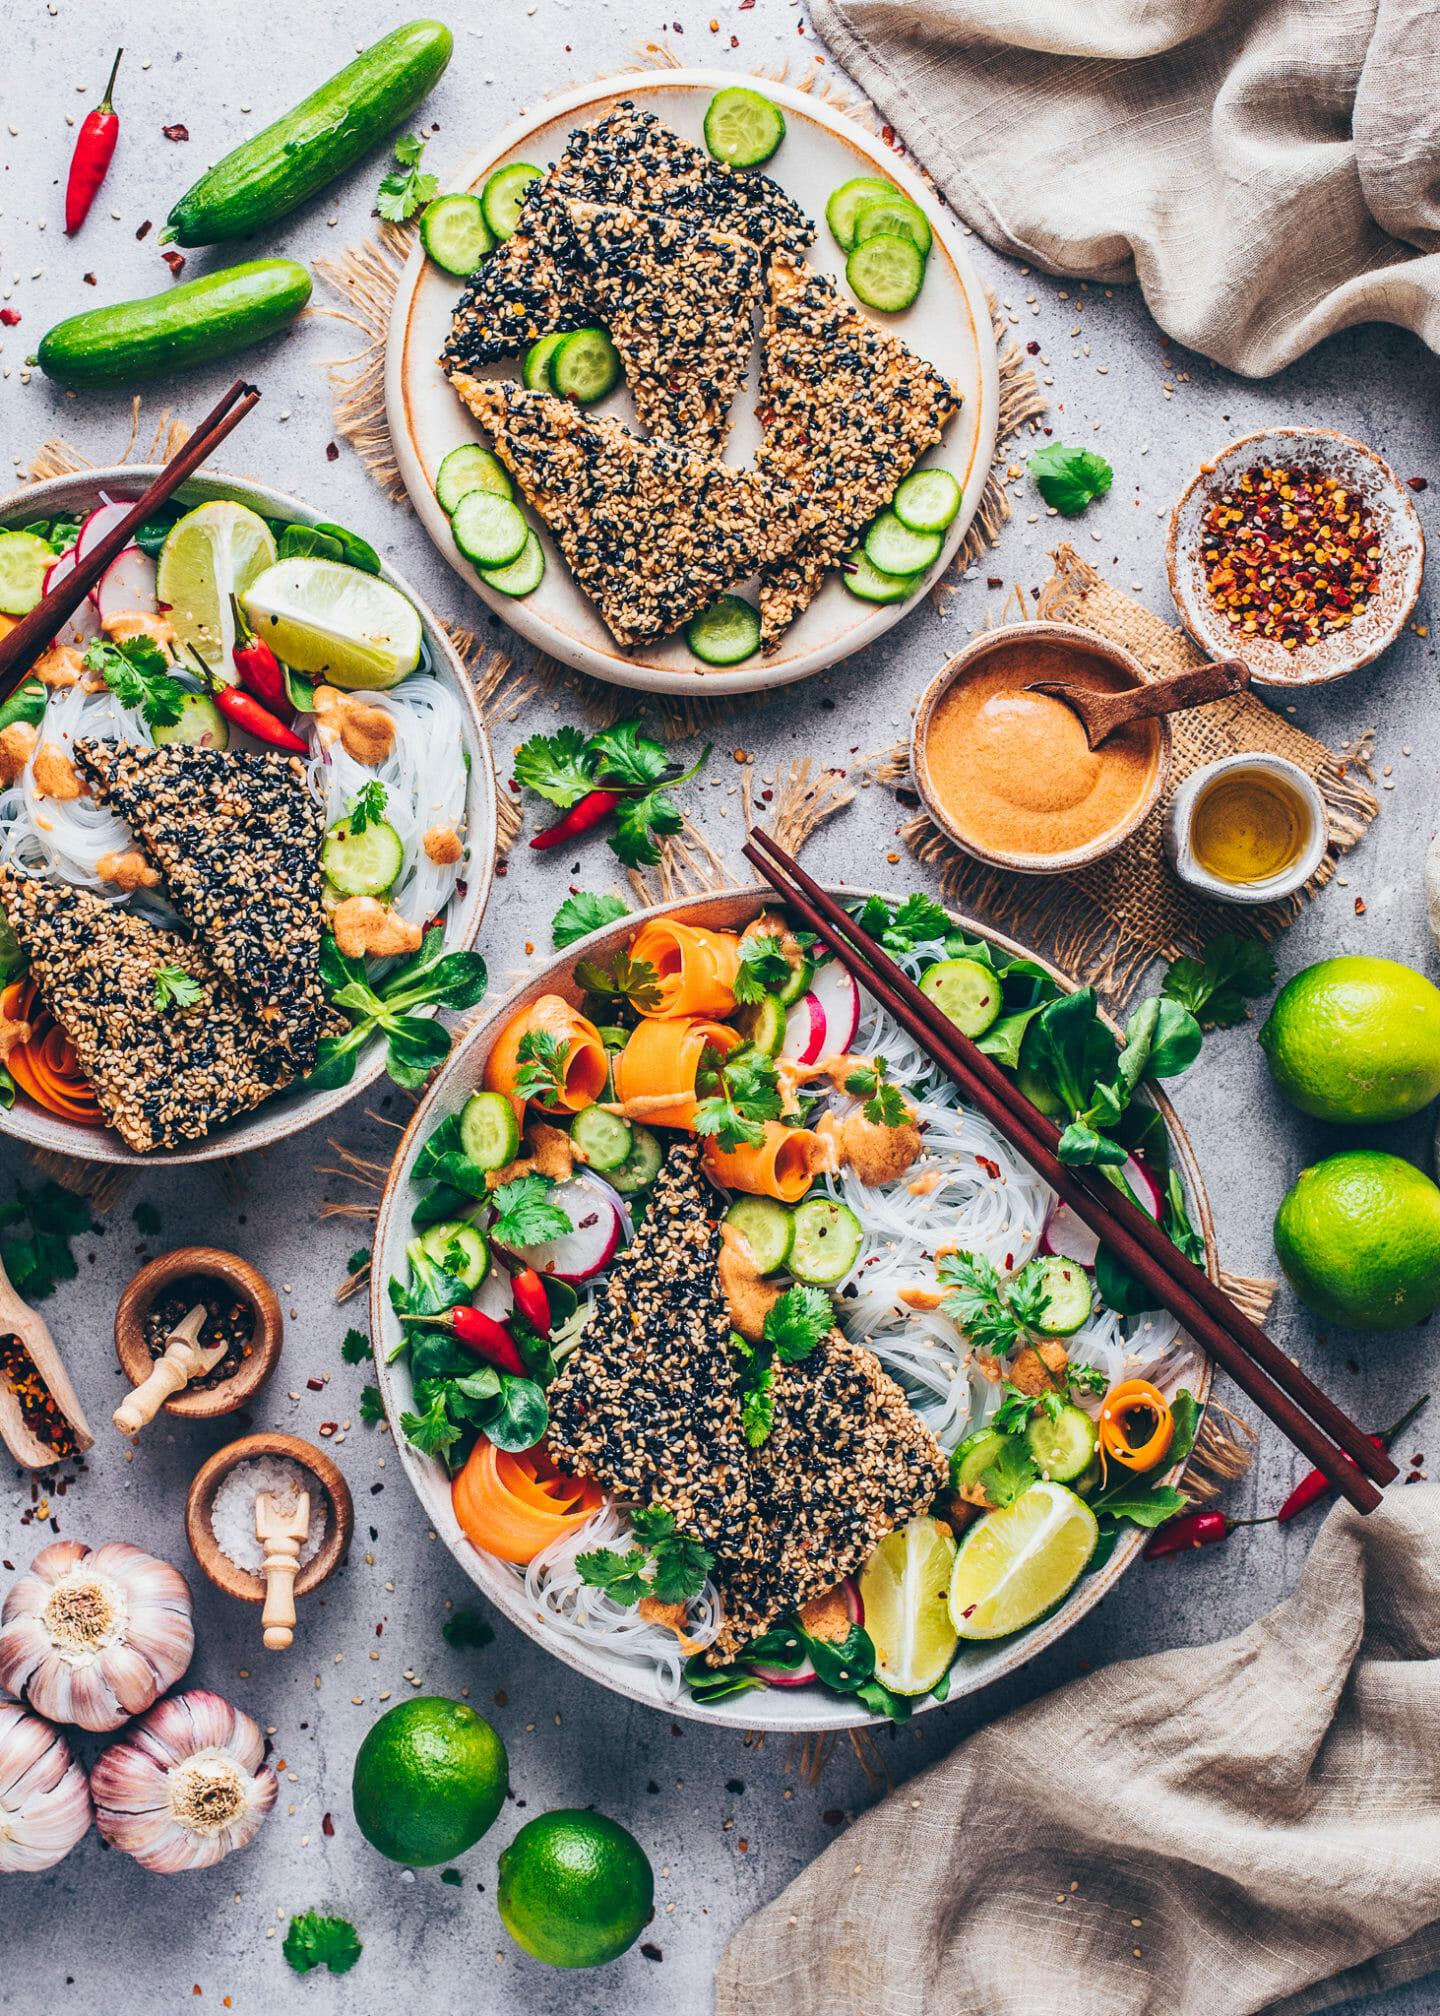 Vietnamese Rice Noodle Salad with Crispy Sesame Tofu and Peanut Dressing